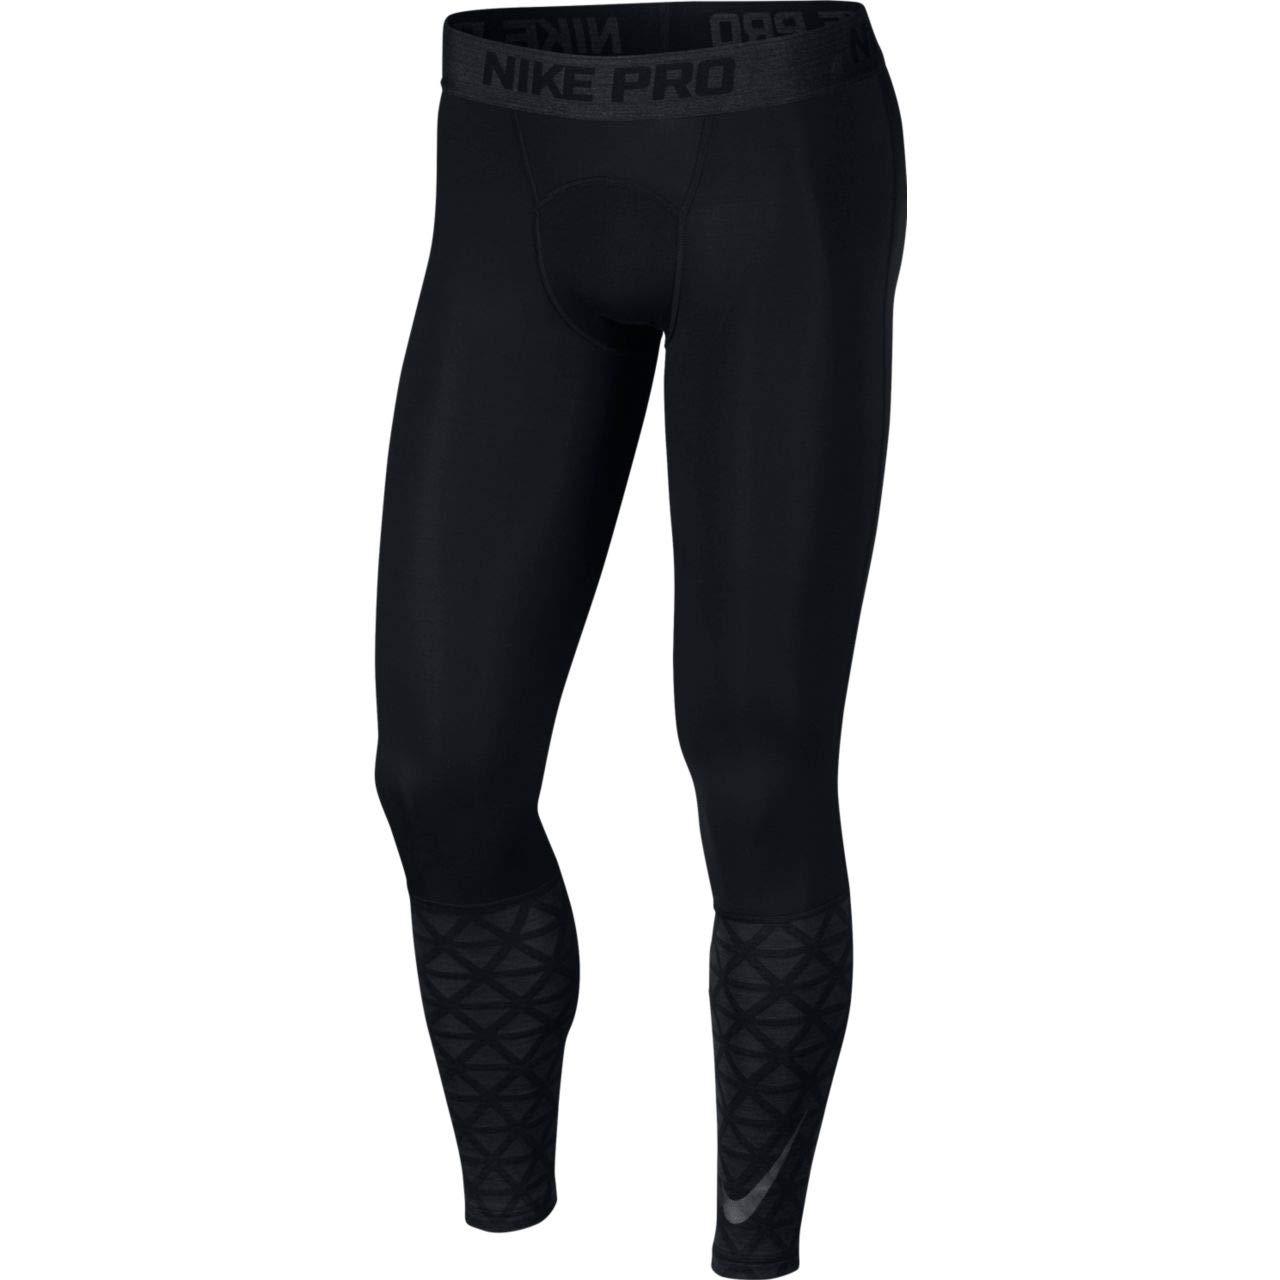 Nike Men's Pro Tights, Black/Anthracite/Black, Medium